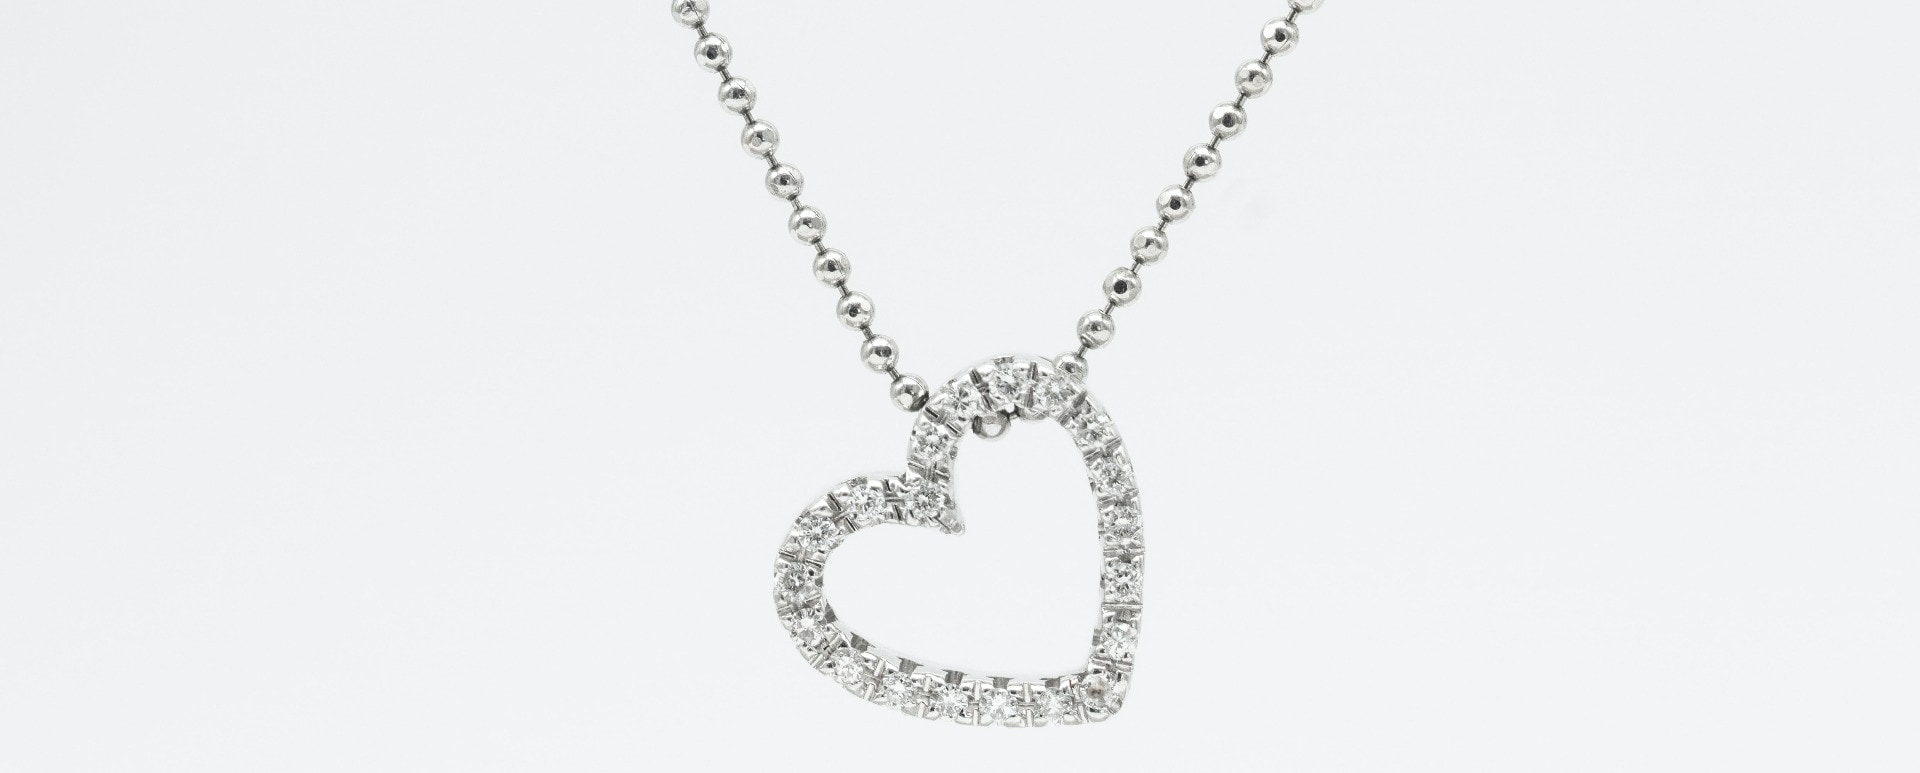 Jewelima Diamonds - Jewelry Shop in Thrissur East, Thrissur